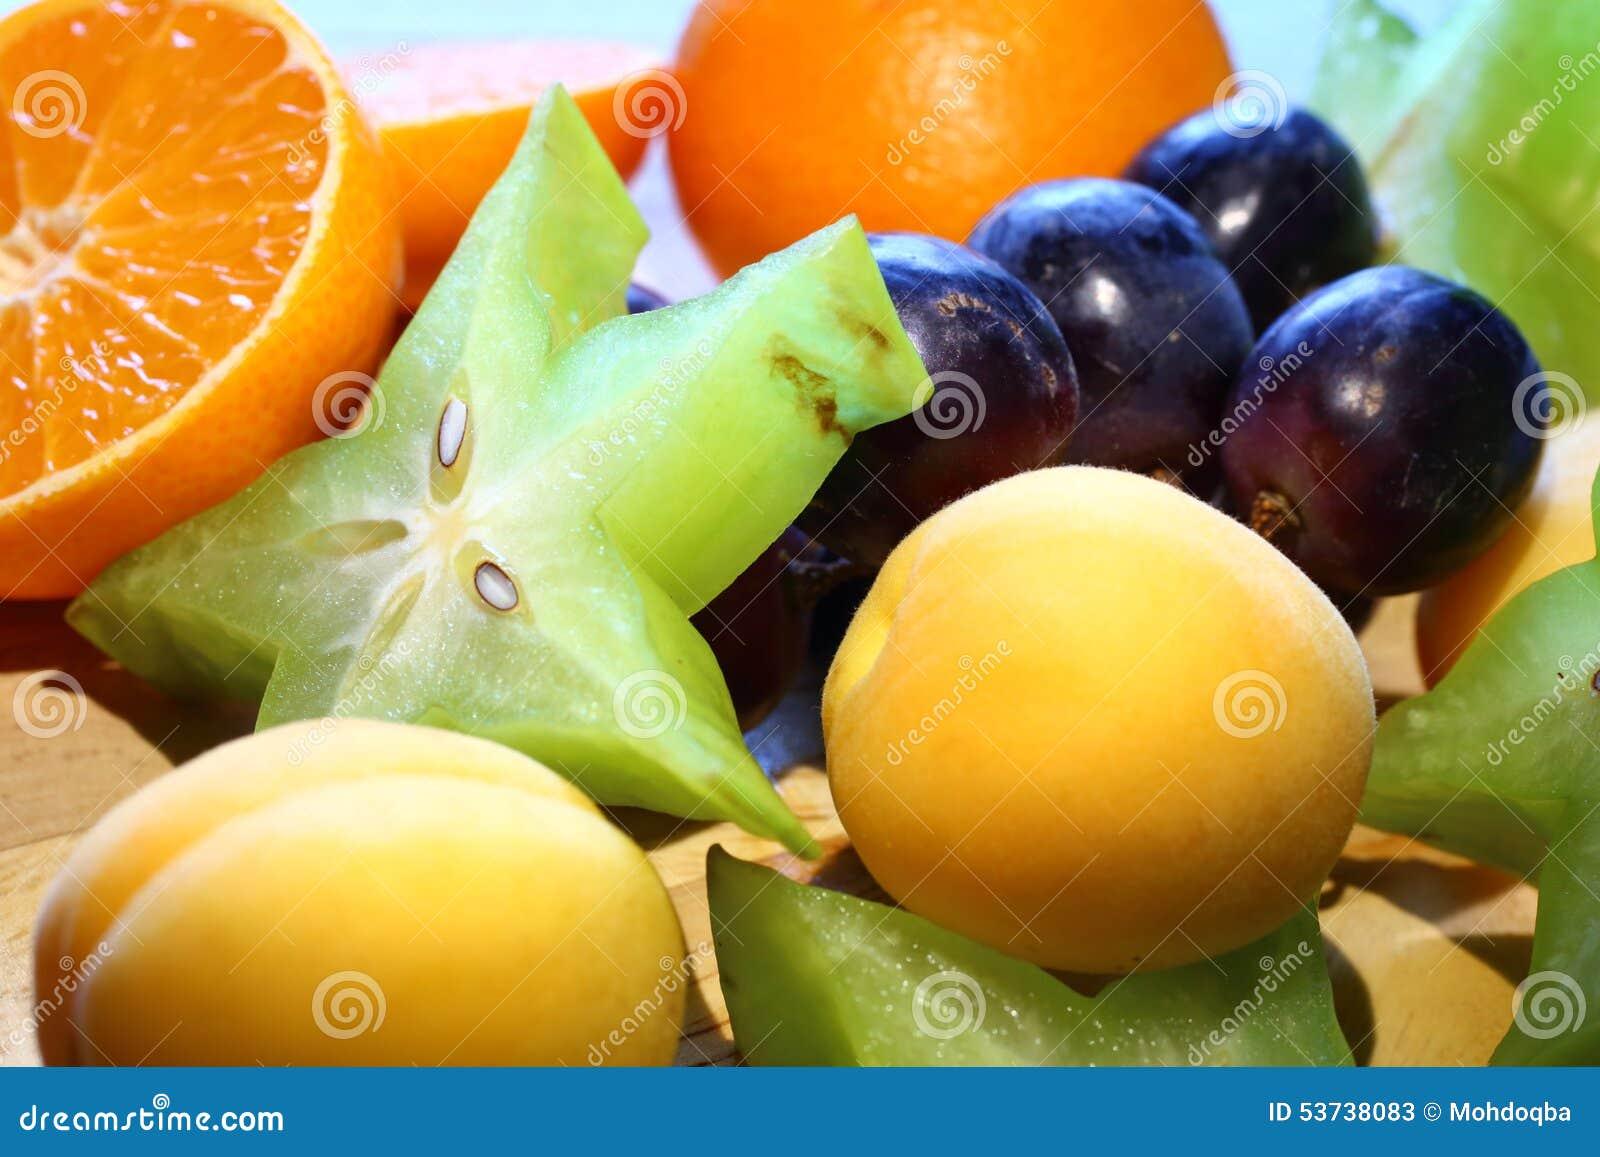 orange fruit star fruit